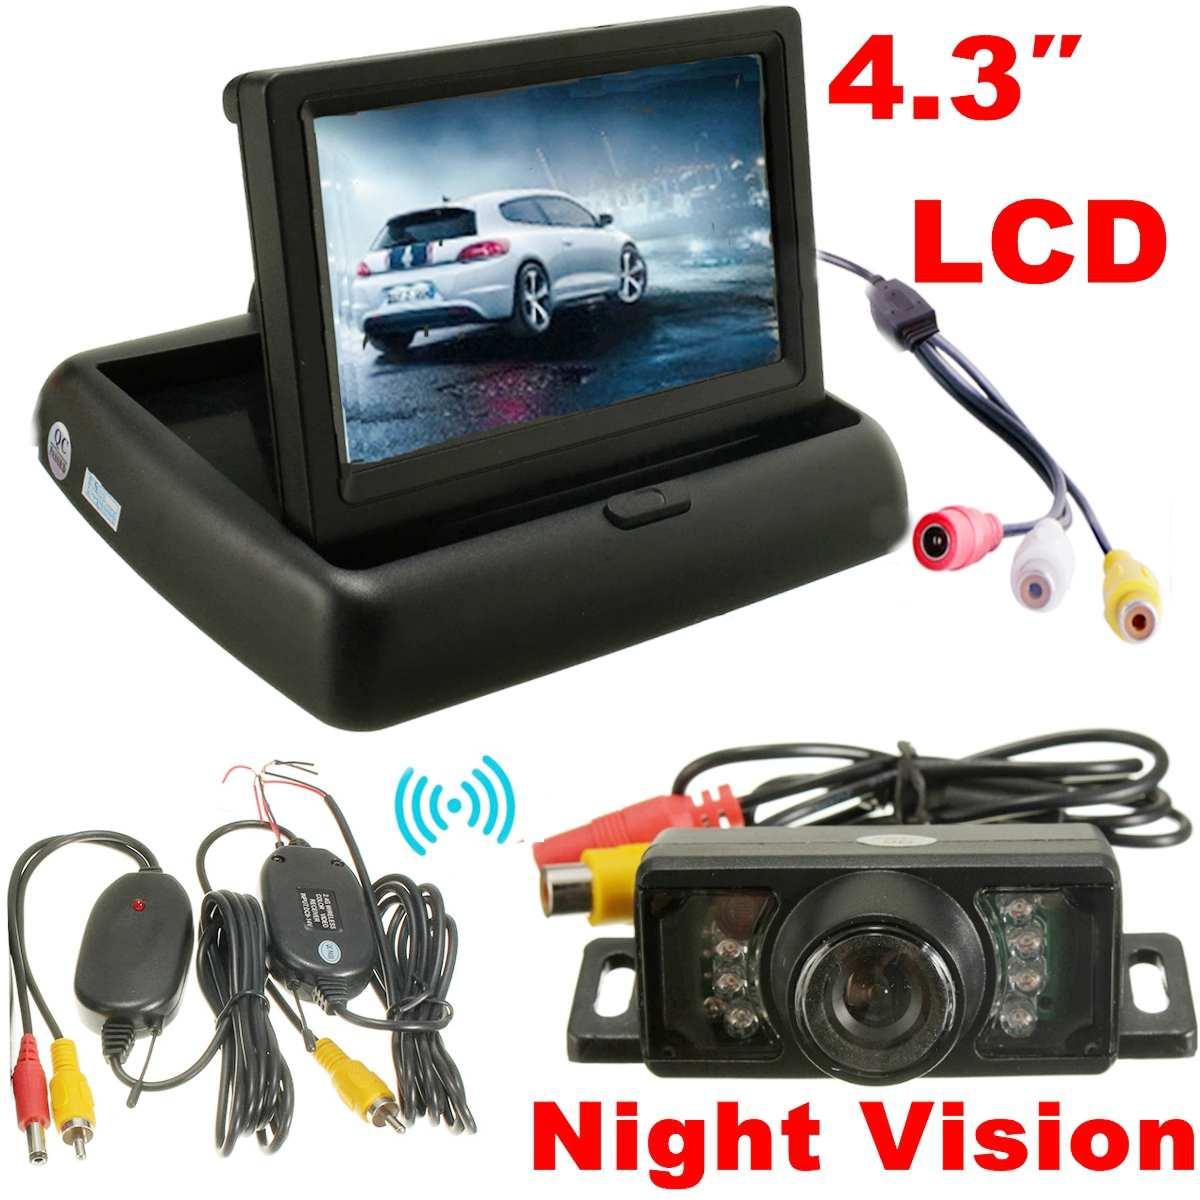 Universal 12V Car 4 3 inch LCD Display Monitor Wireless IR Rearview Parking Reversing Camera 120 Degree Rear View Backup Camera